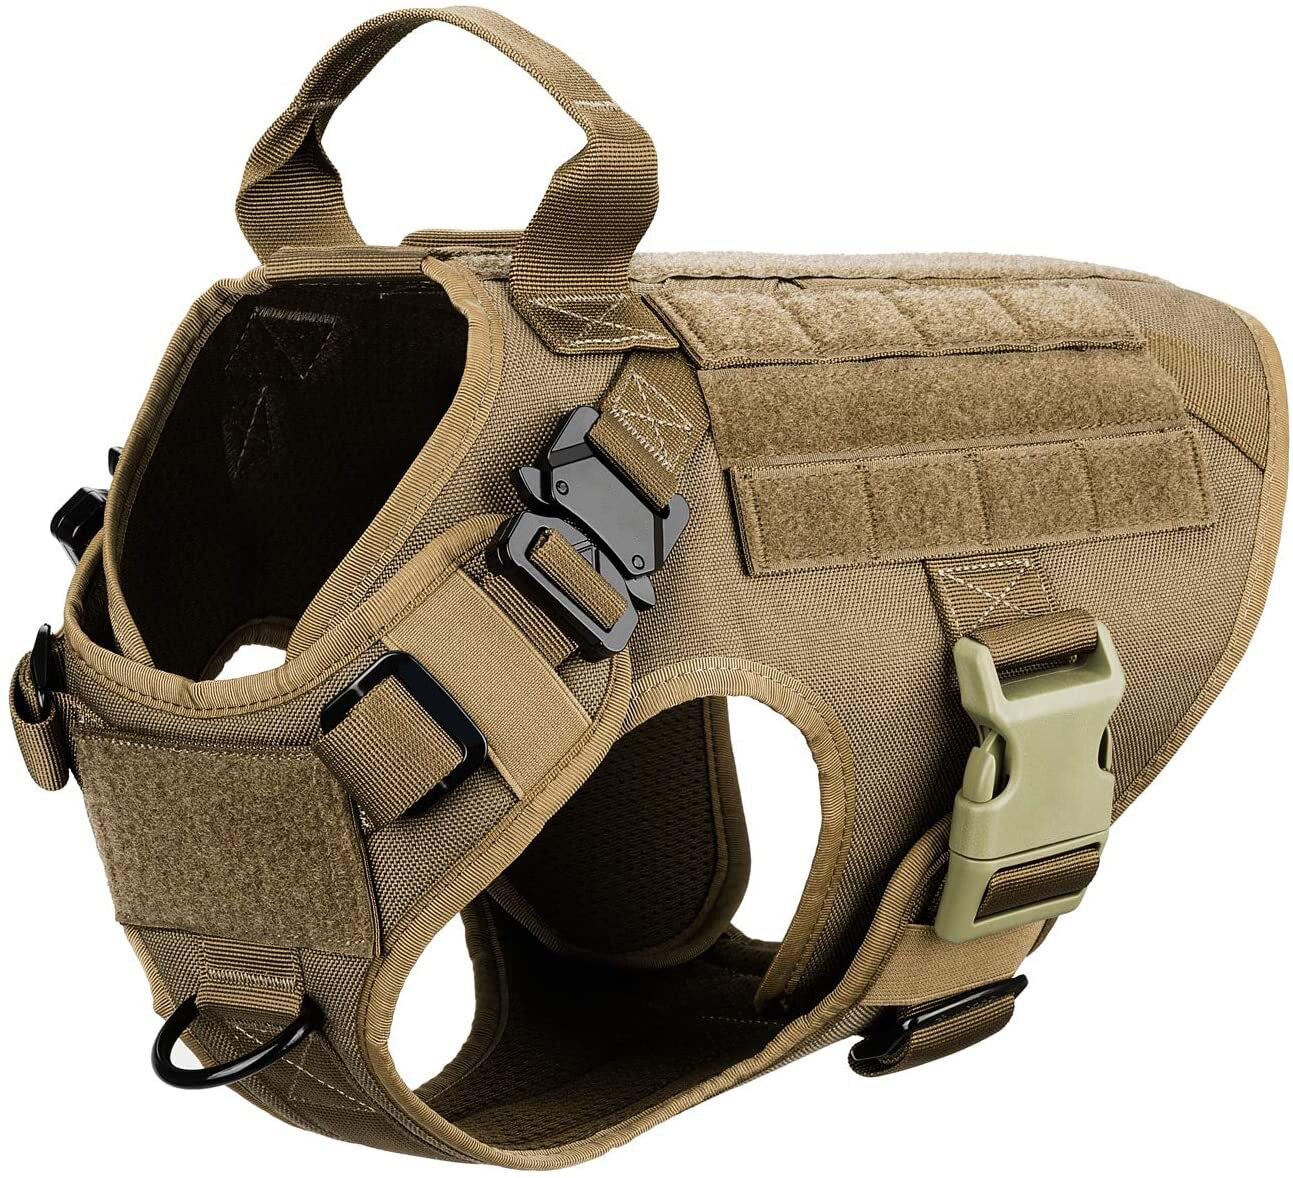 Tactical Dog Harness for German Shepherd